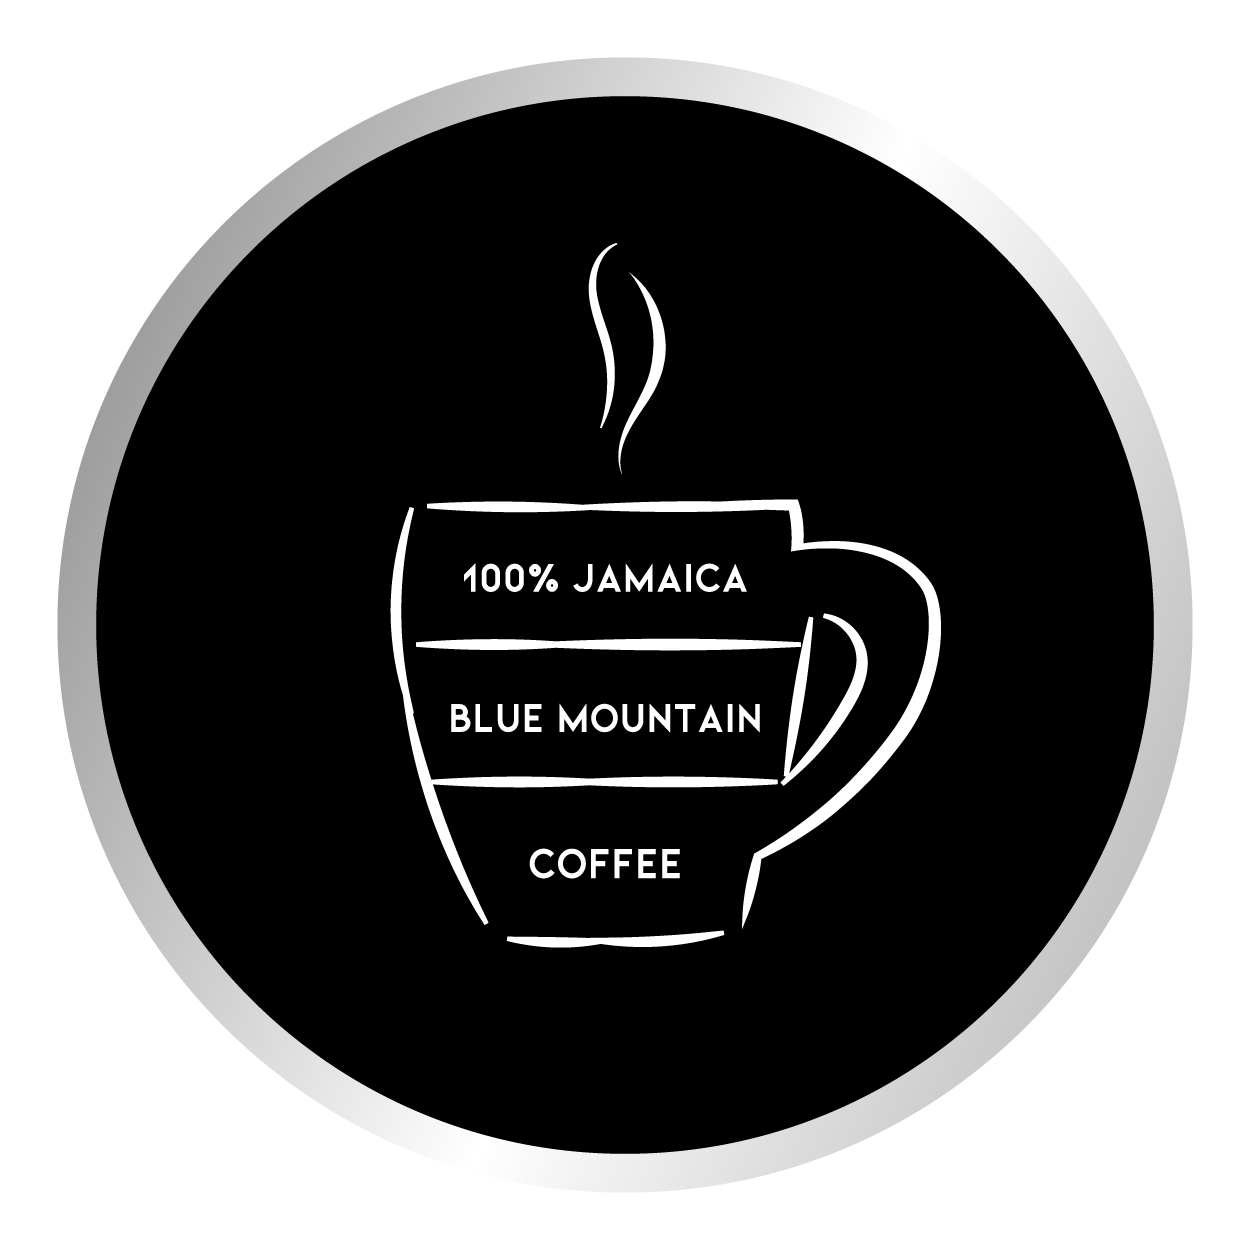 100 % Jamaica Blue Mountain Coffee